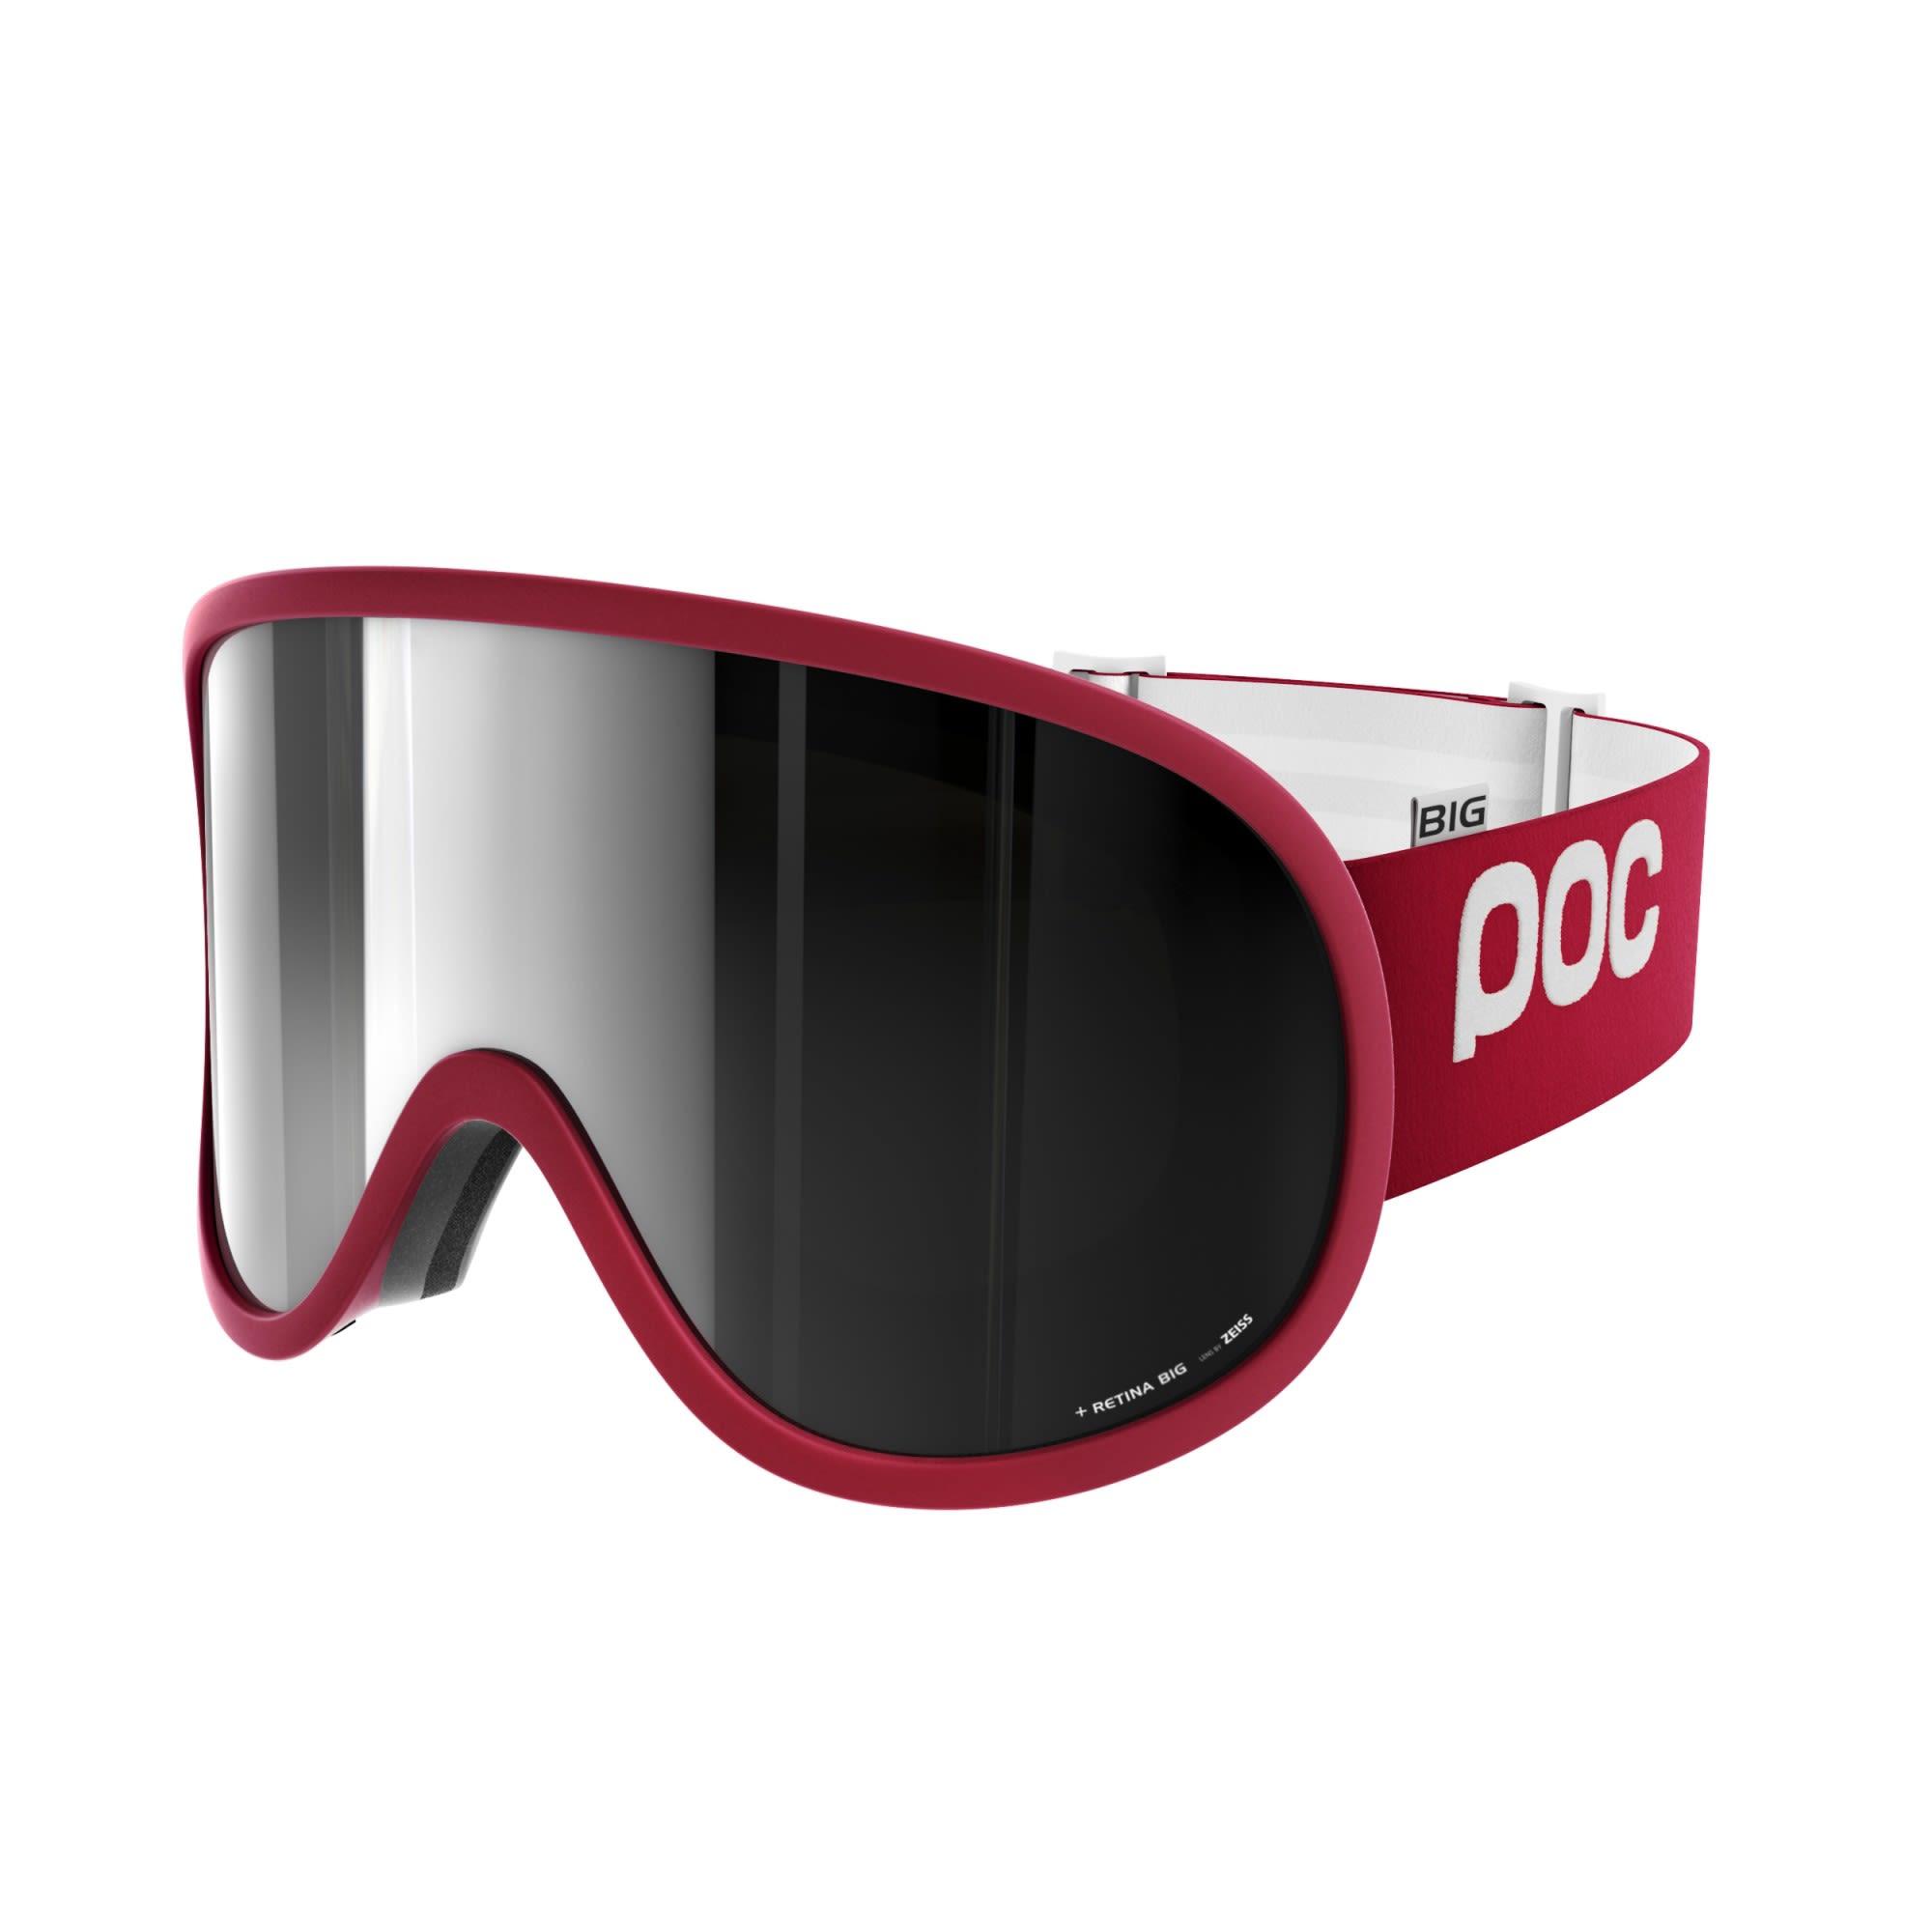 POC Retina Big (Modell Winter 2017) |  Skibrille